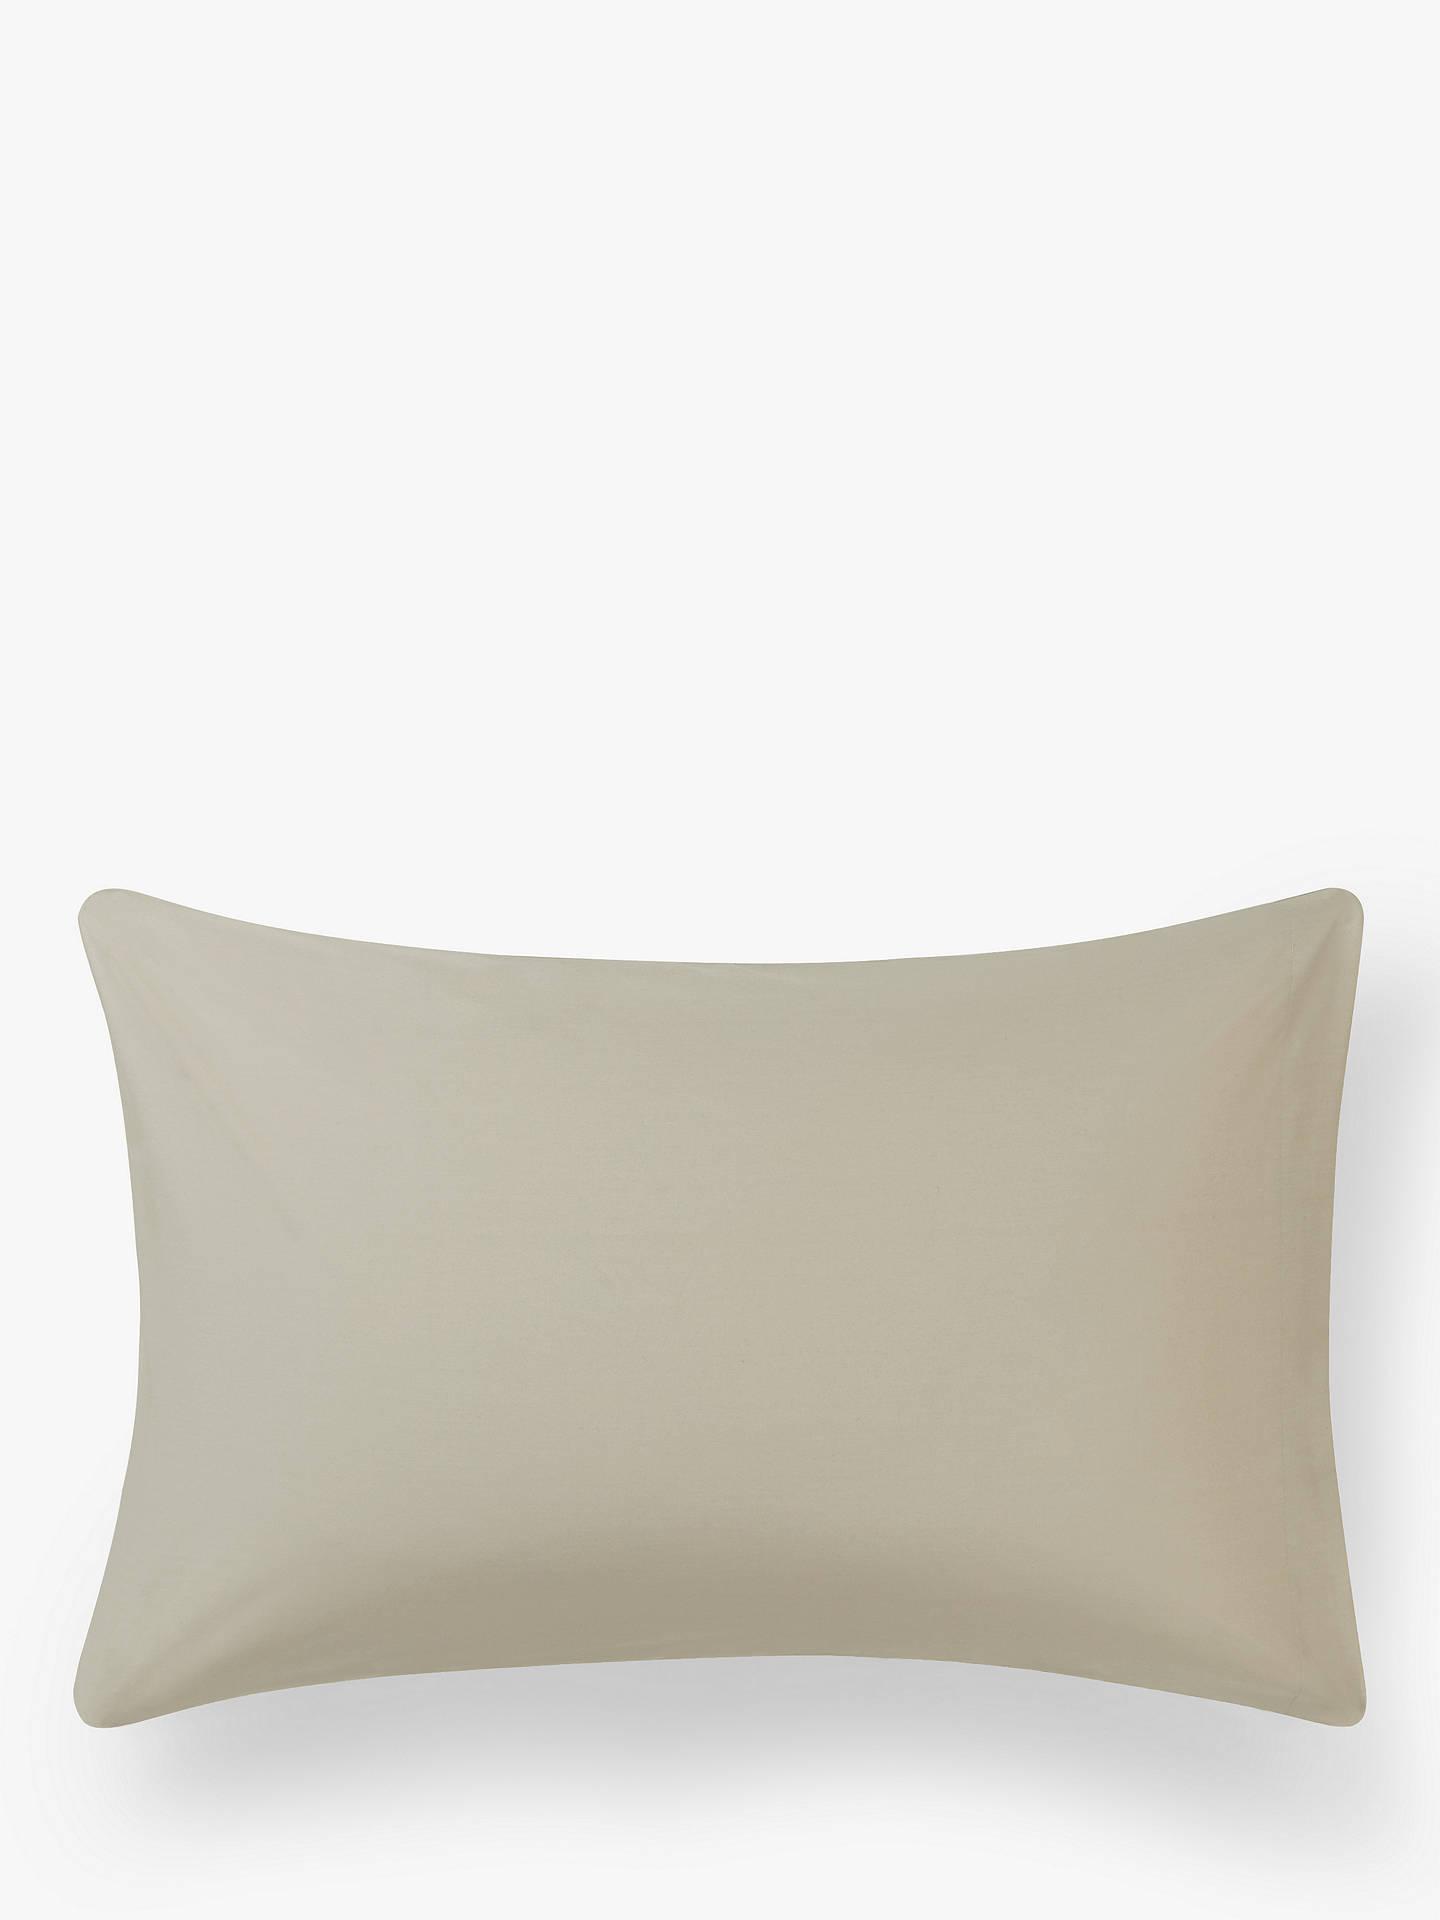 Buy John Lewis & Partners 200 Thread Count Cotton Standard Pilowcase, Latte Online at johnlewis.com